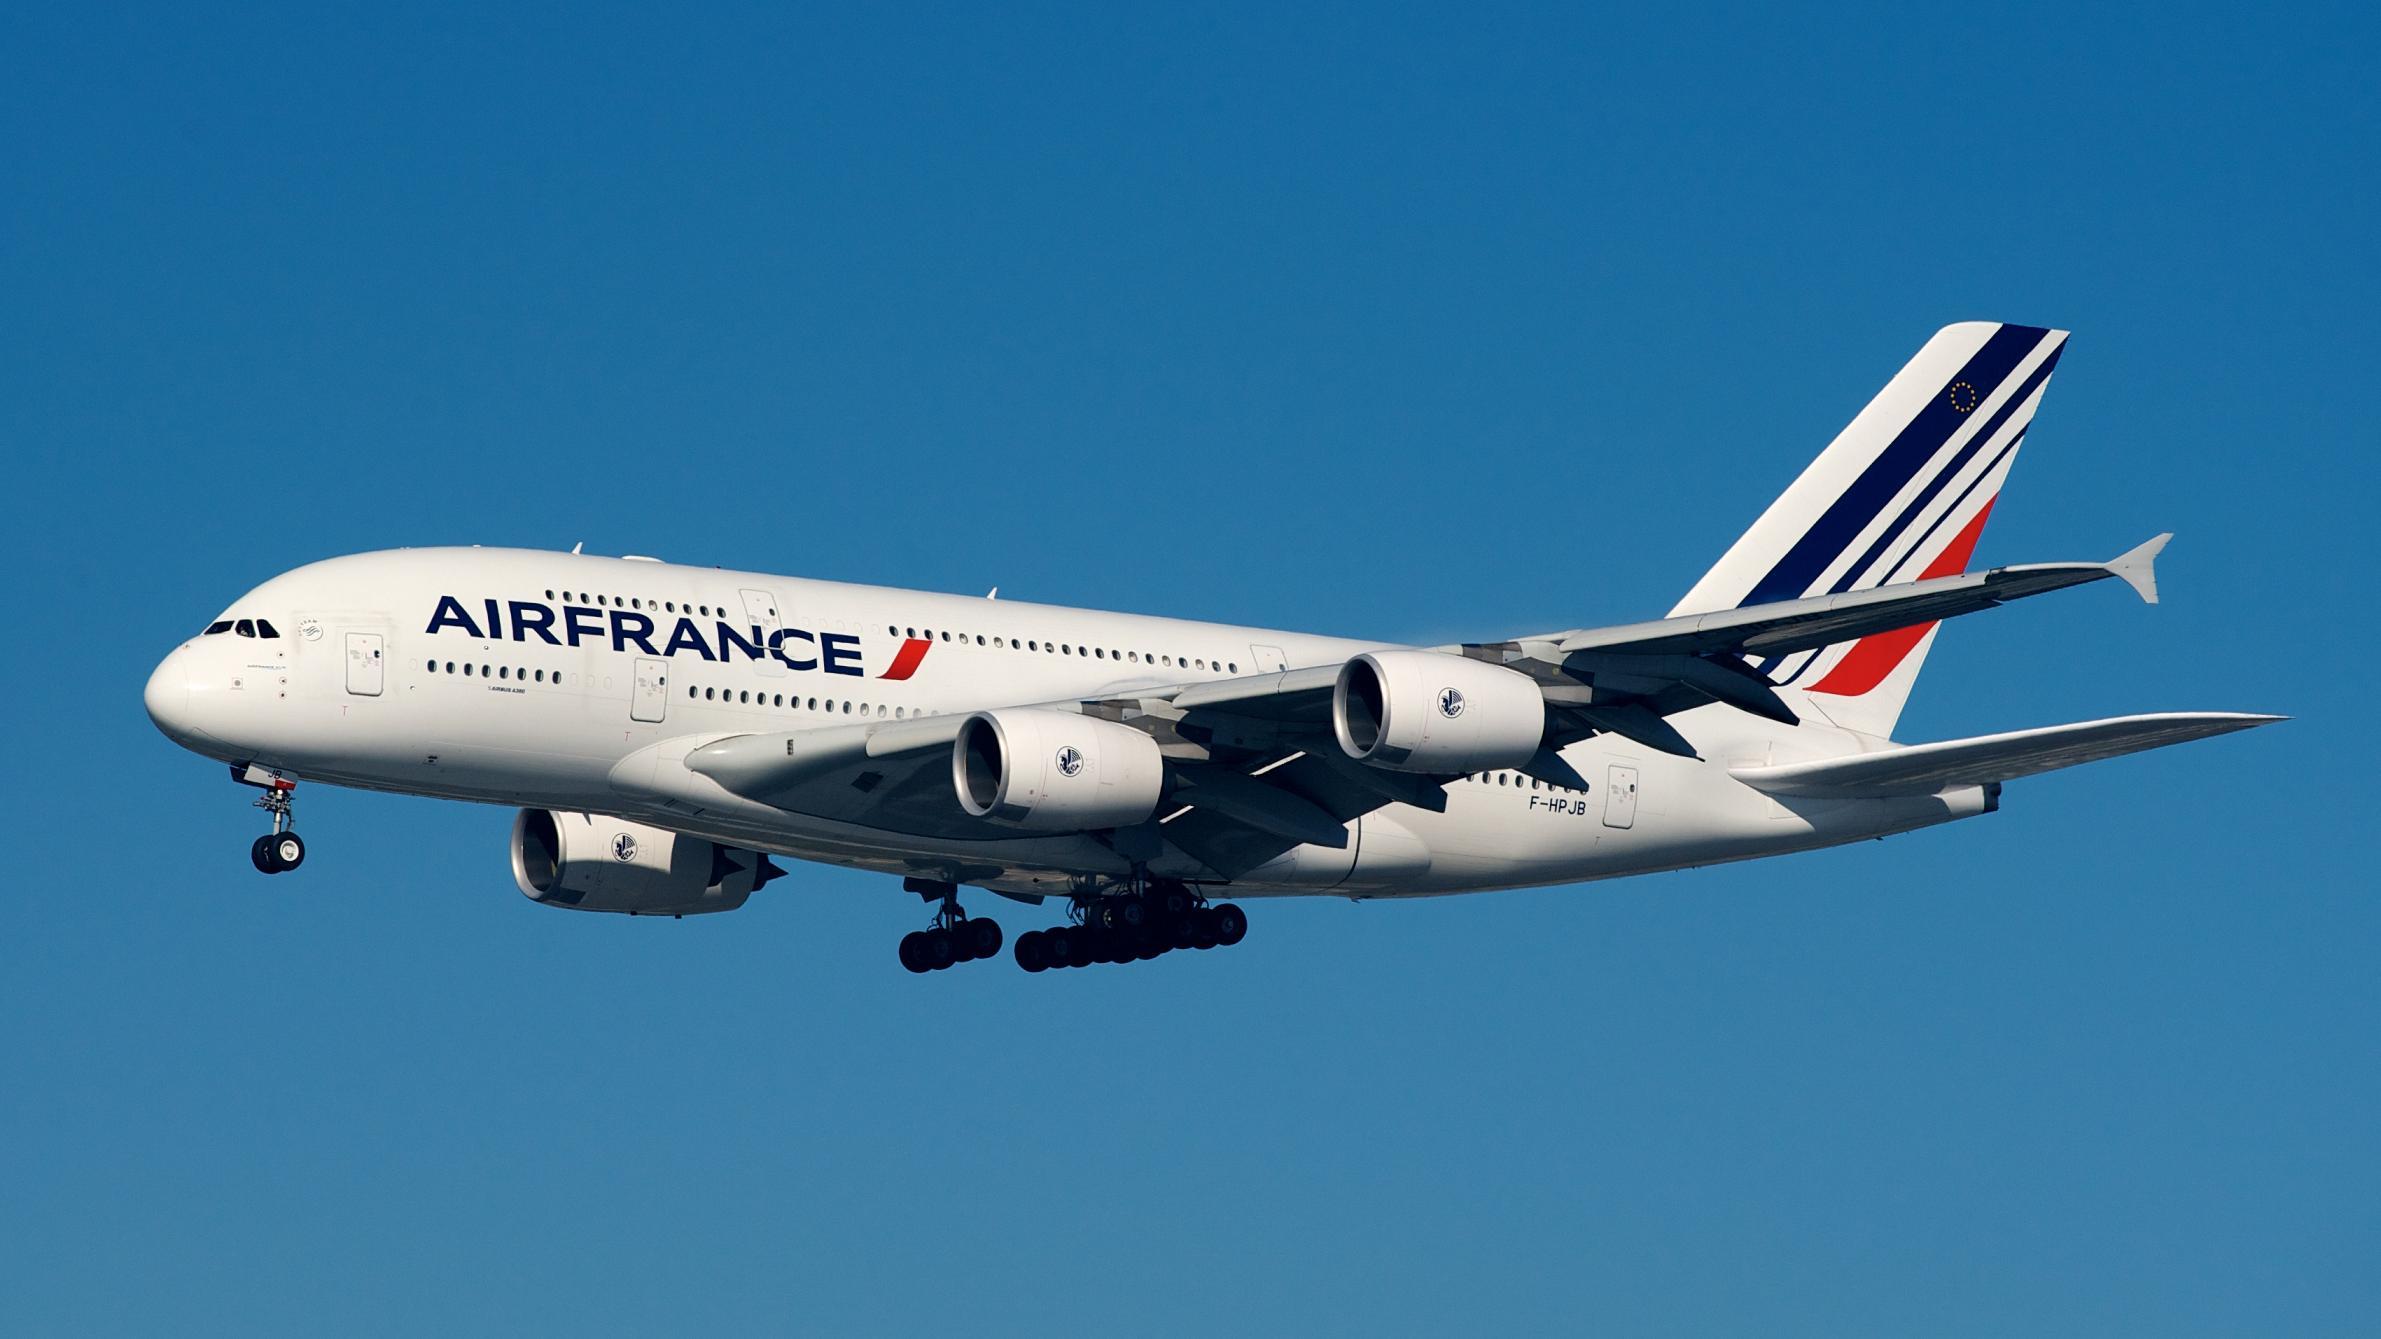 Air France Airbus A380-800 F-HPJB